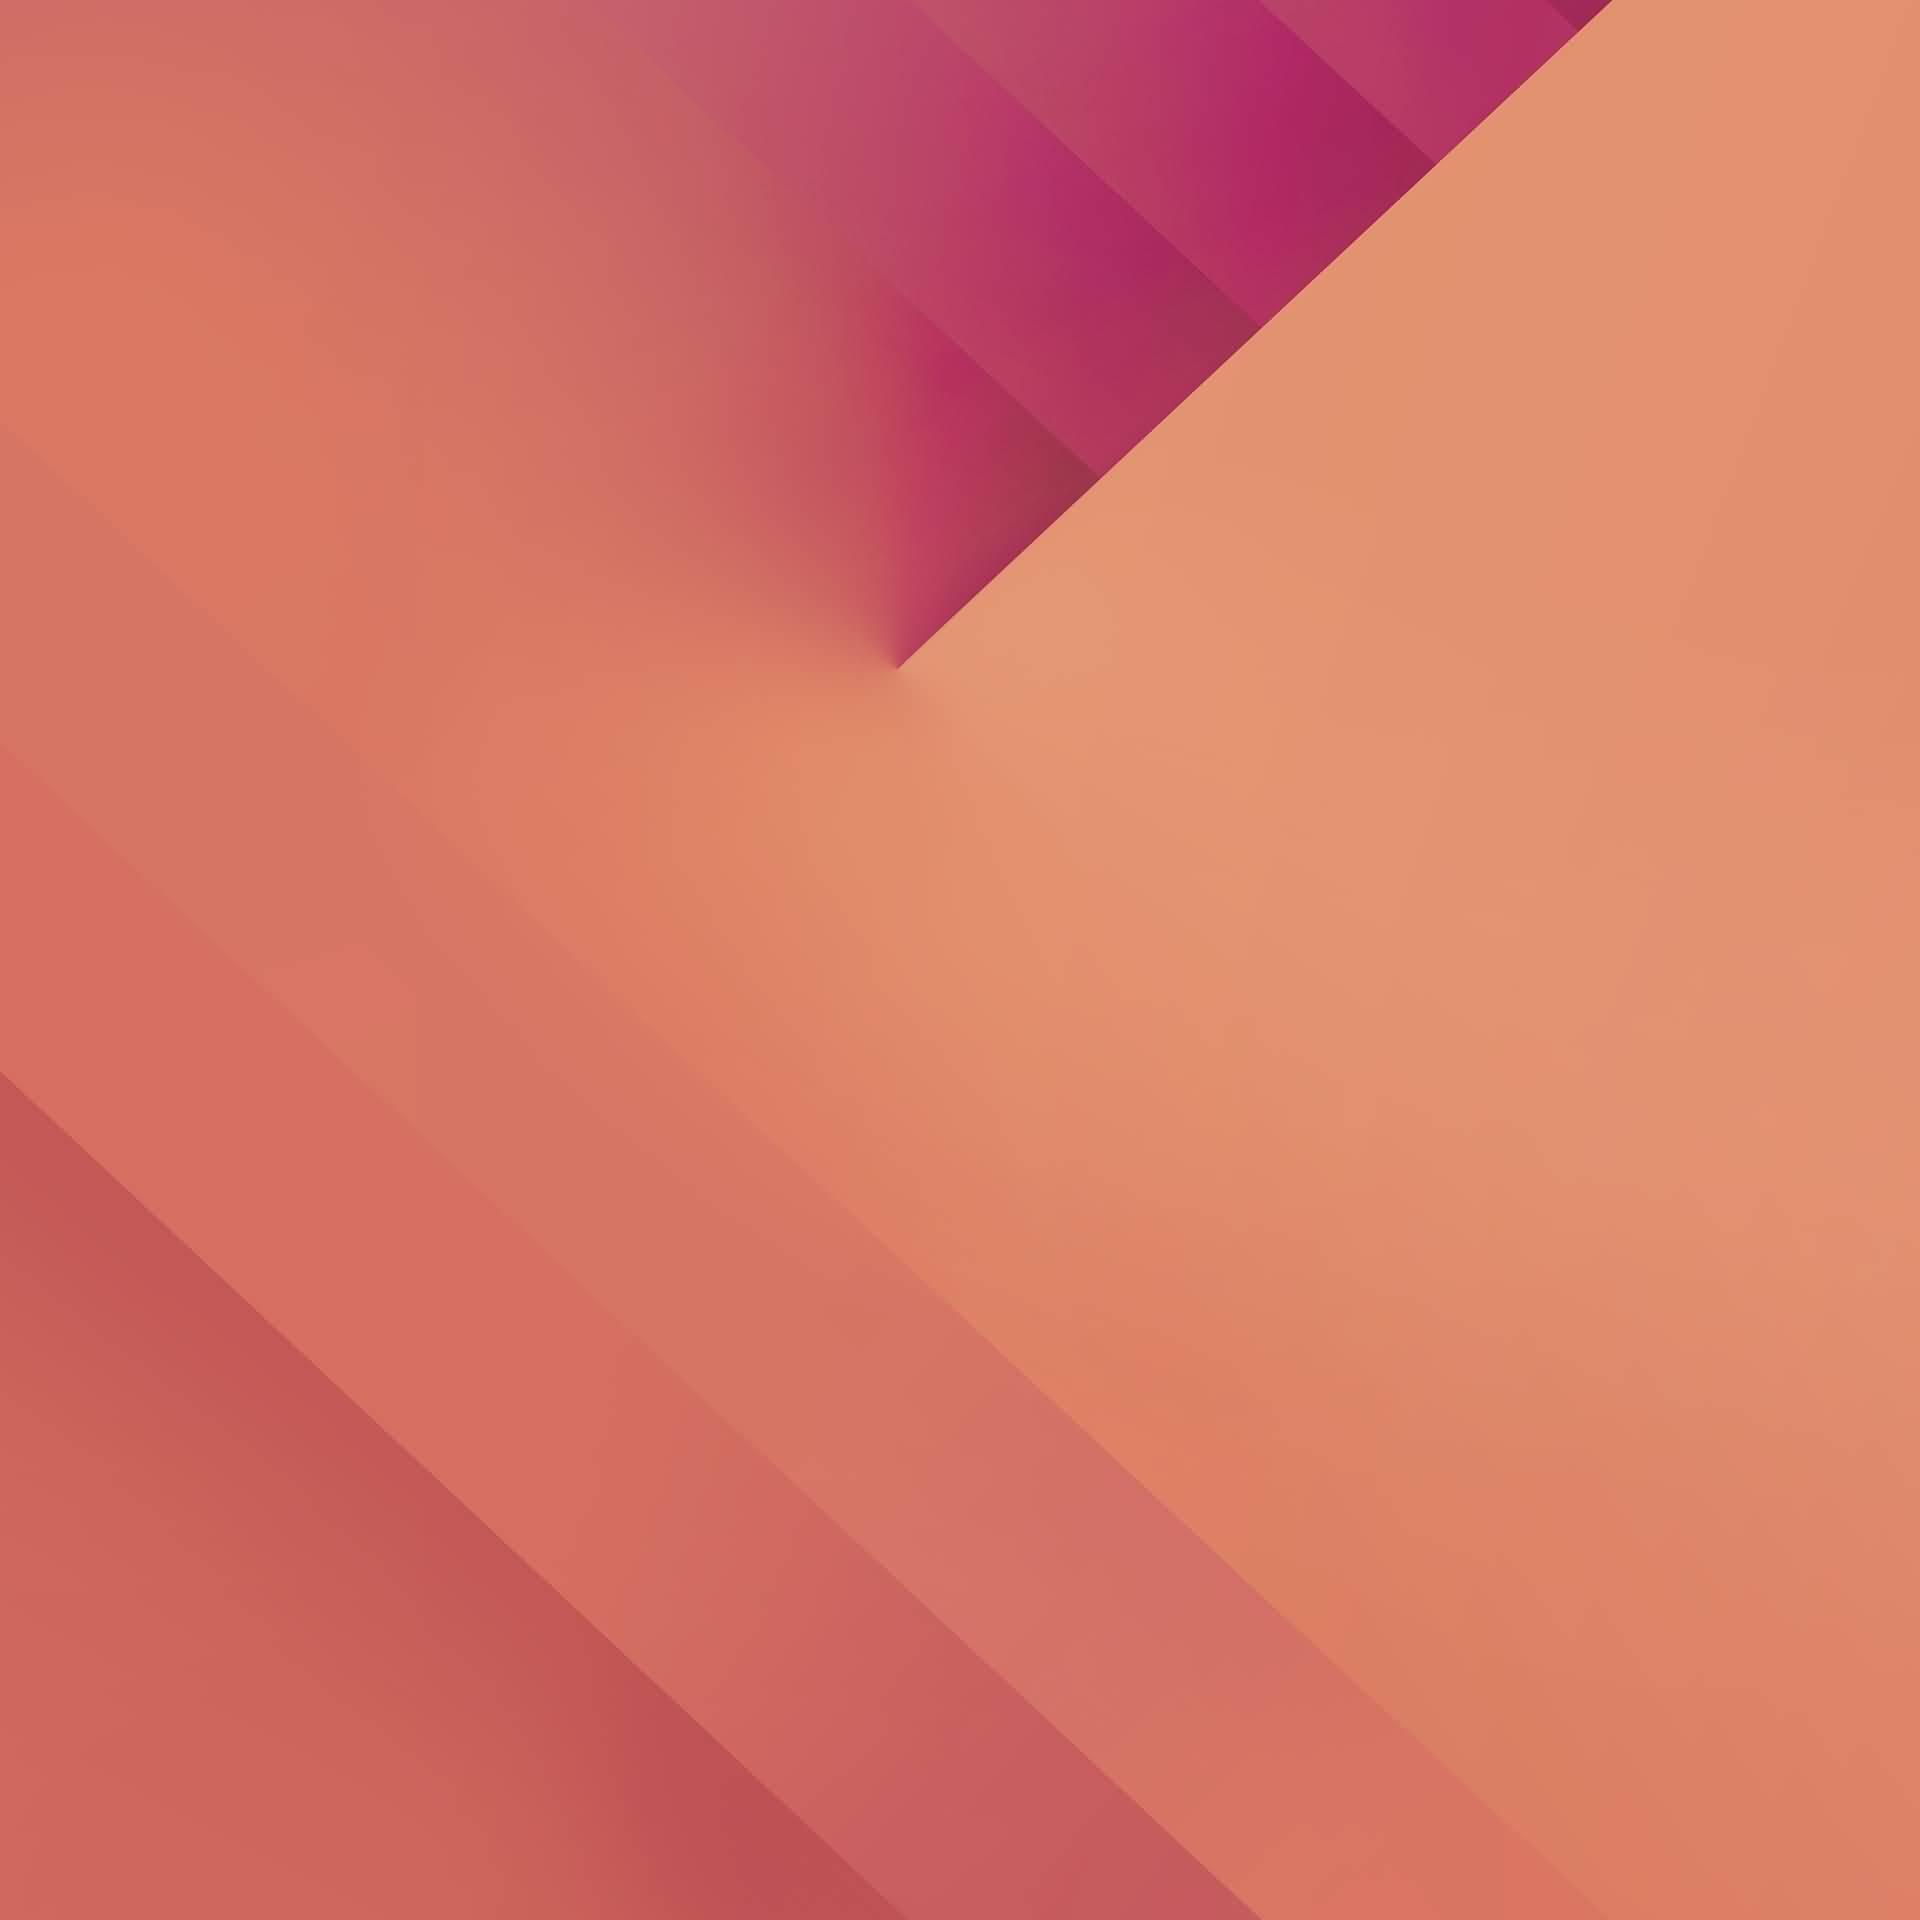 Samsung a5 wallpaper hd download